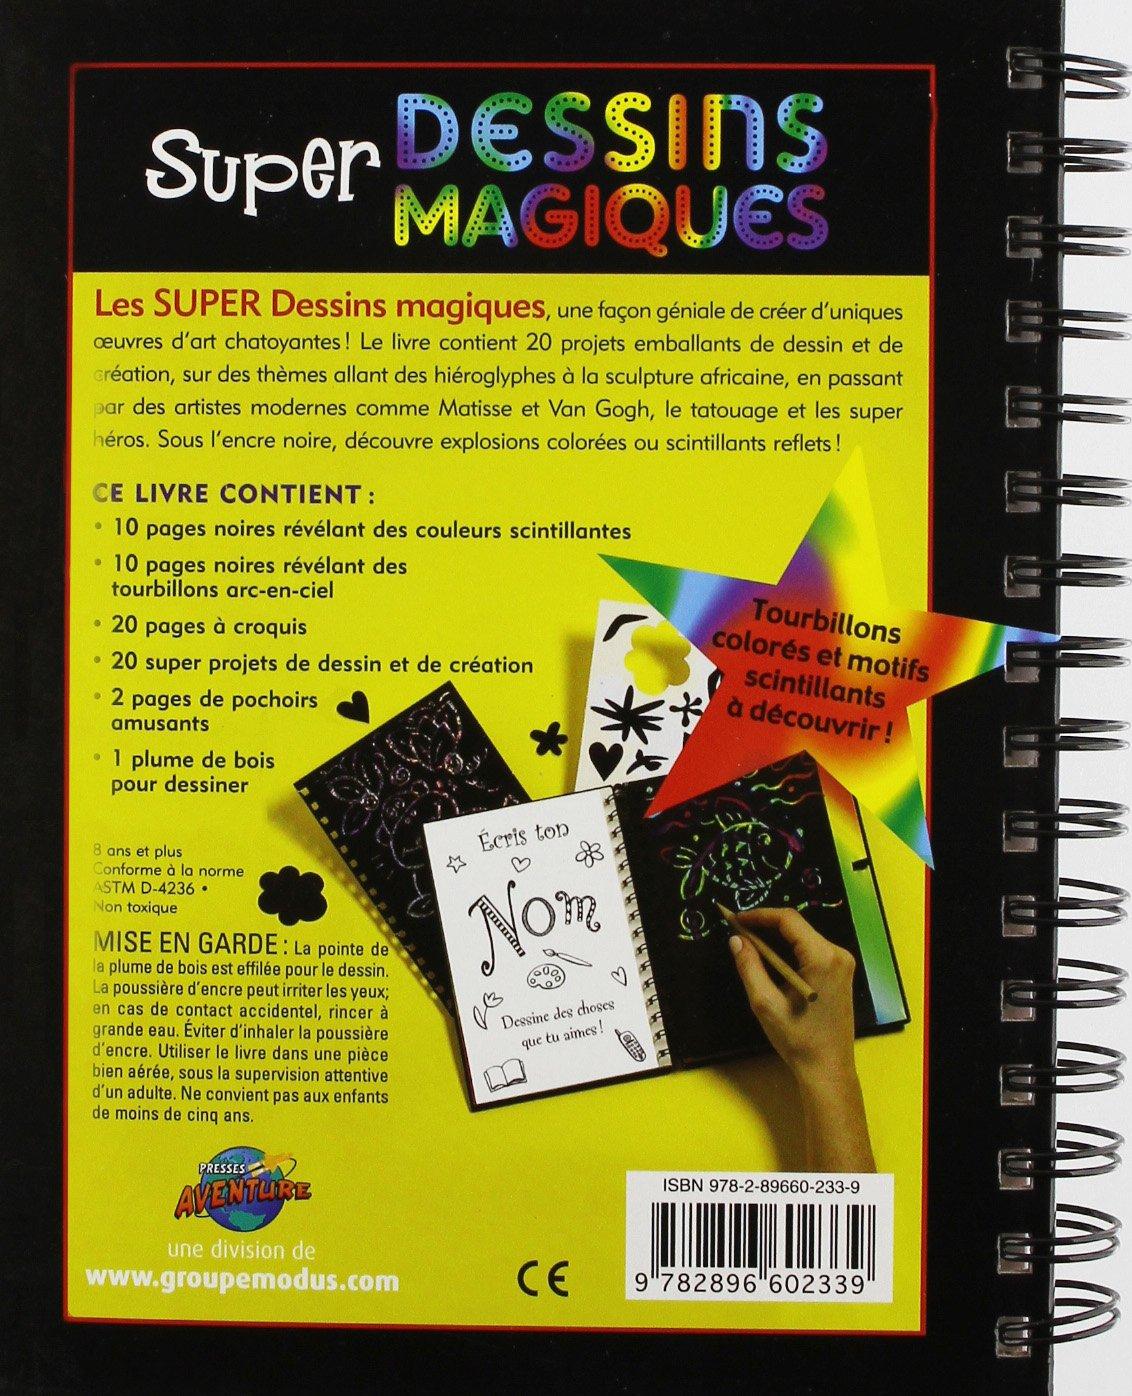 26 avril 2011 Collectif PRESSE AVENTURE 289660233X TL289660233X Super dessins magiques Reliure à spirales